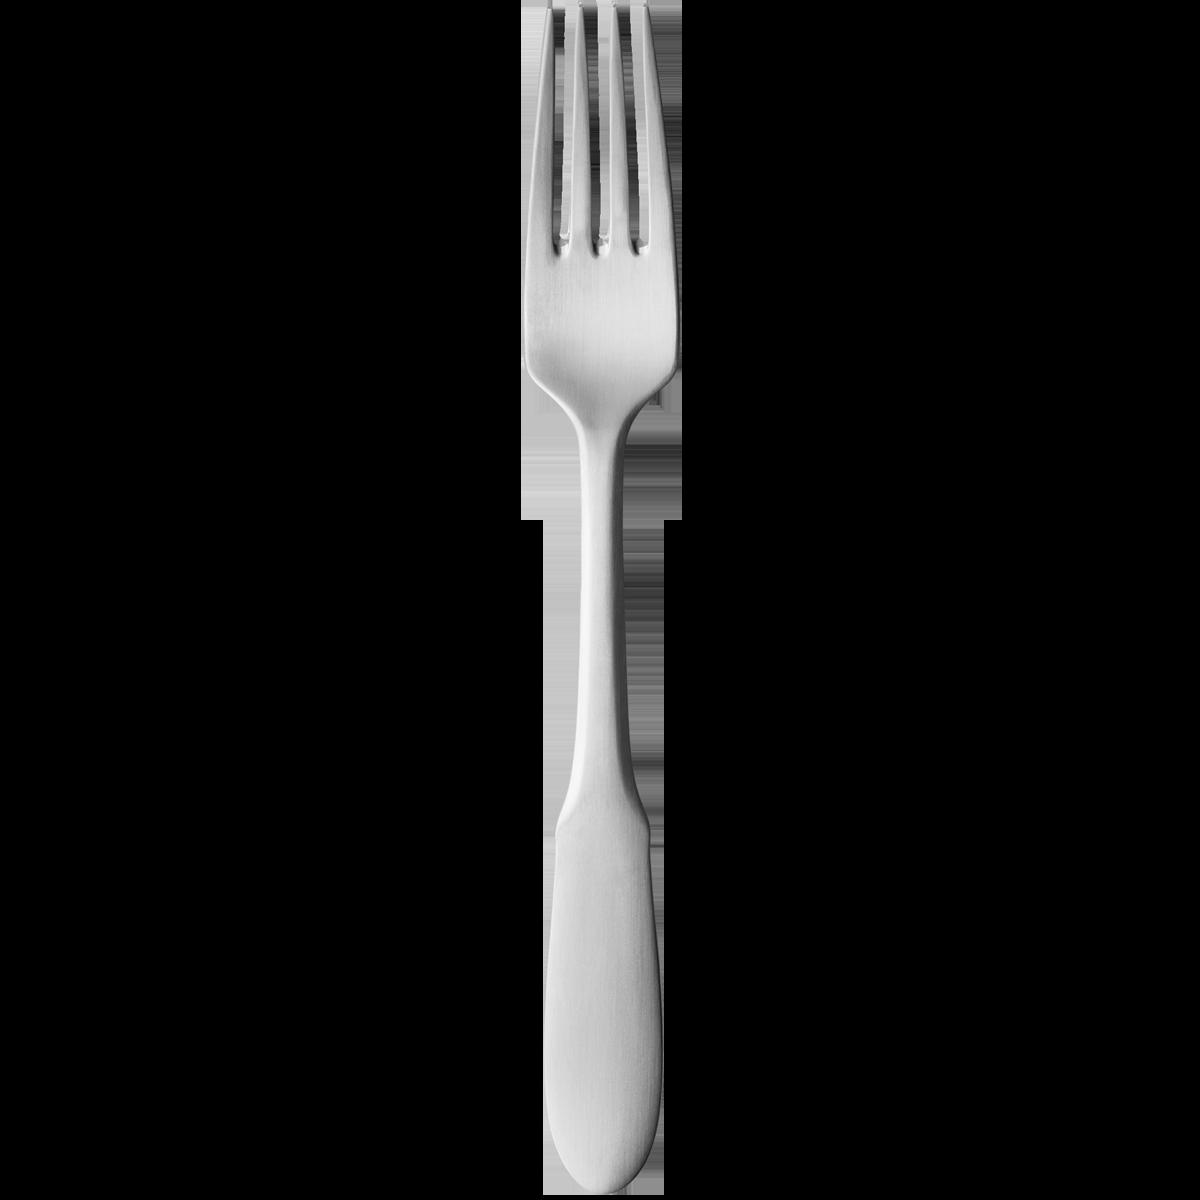 Fork PNG image free Download